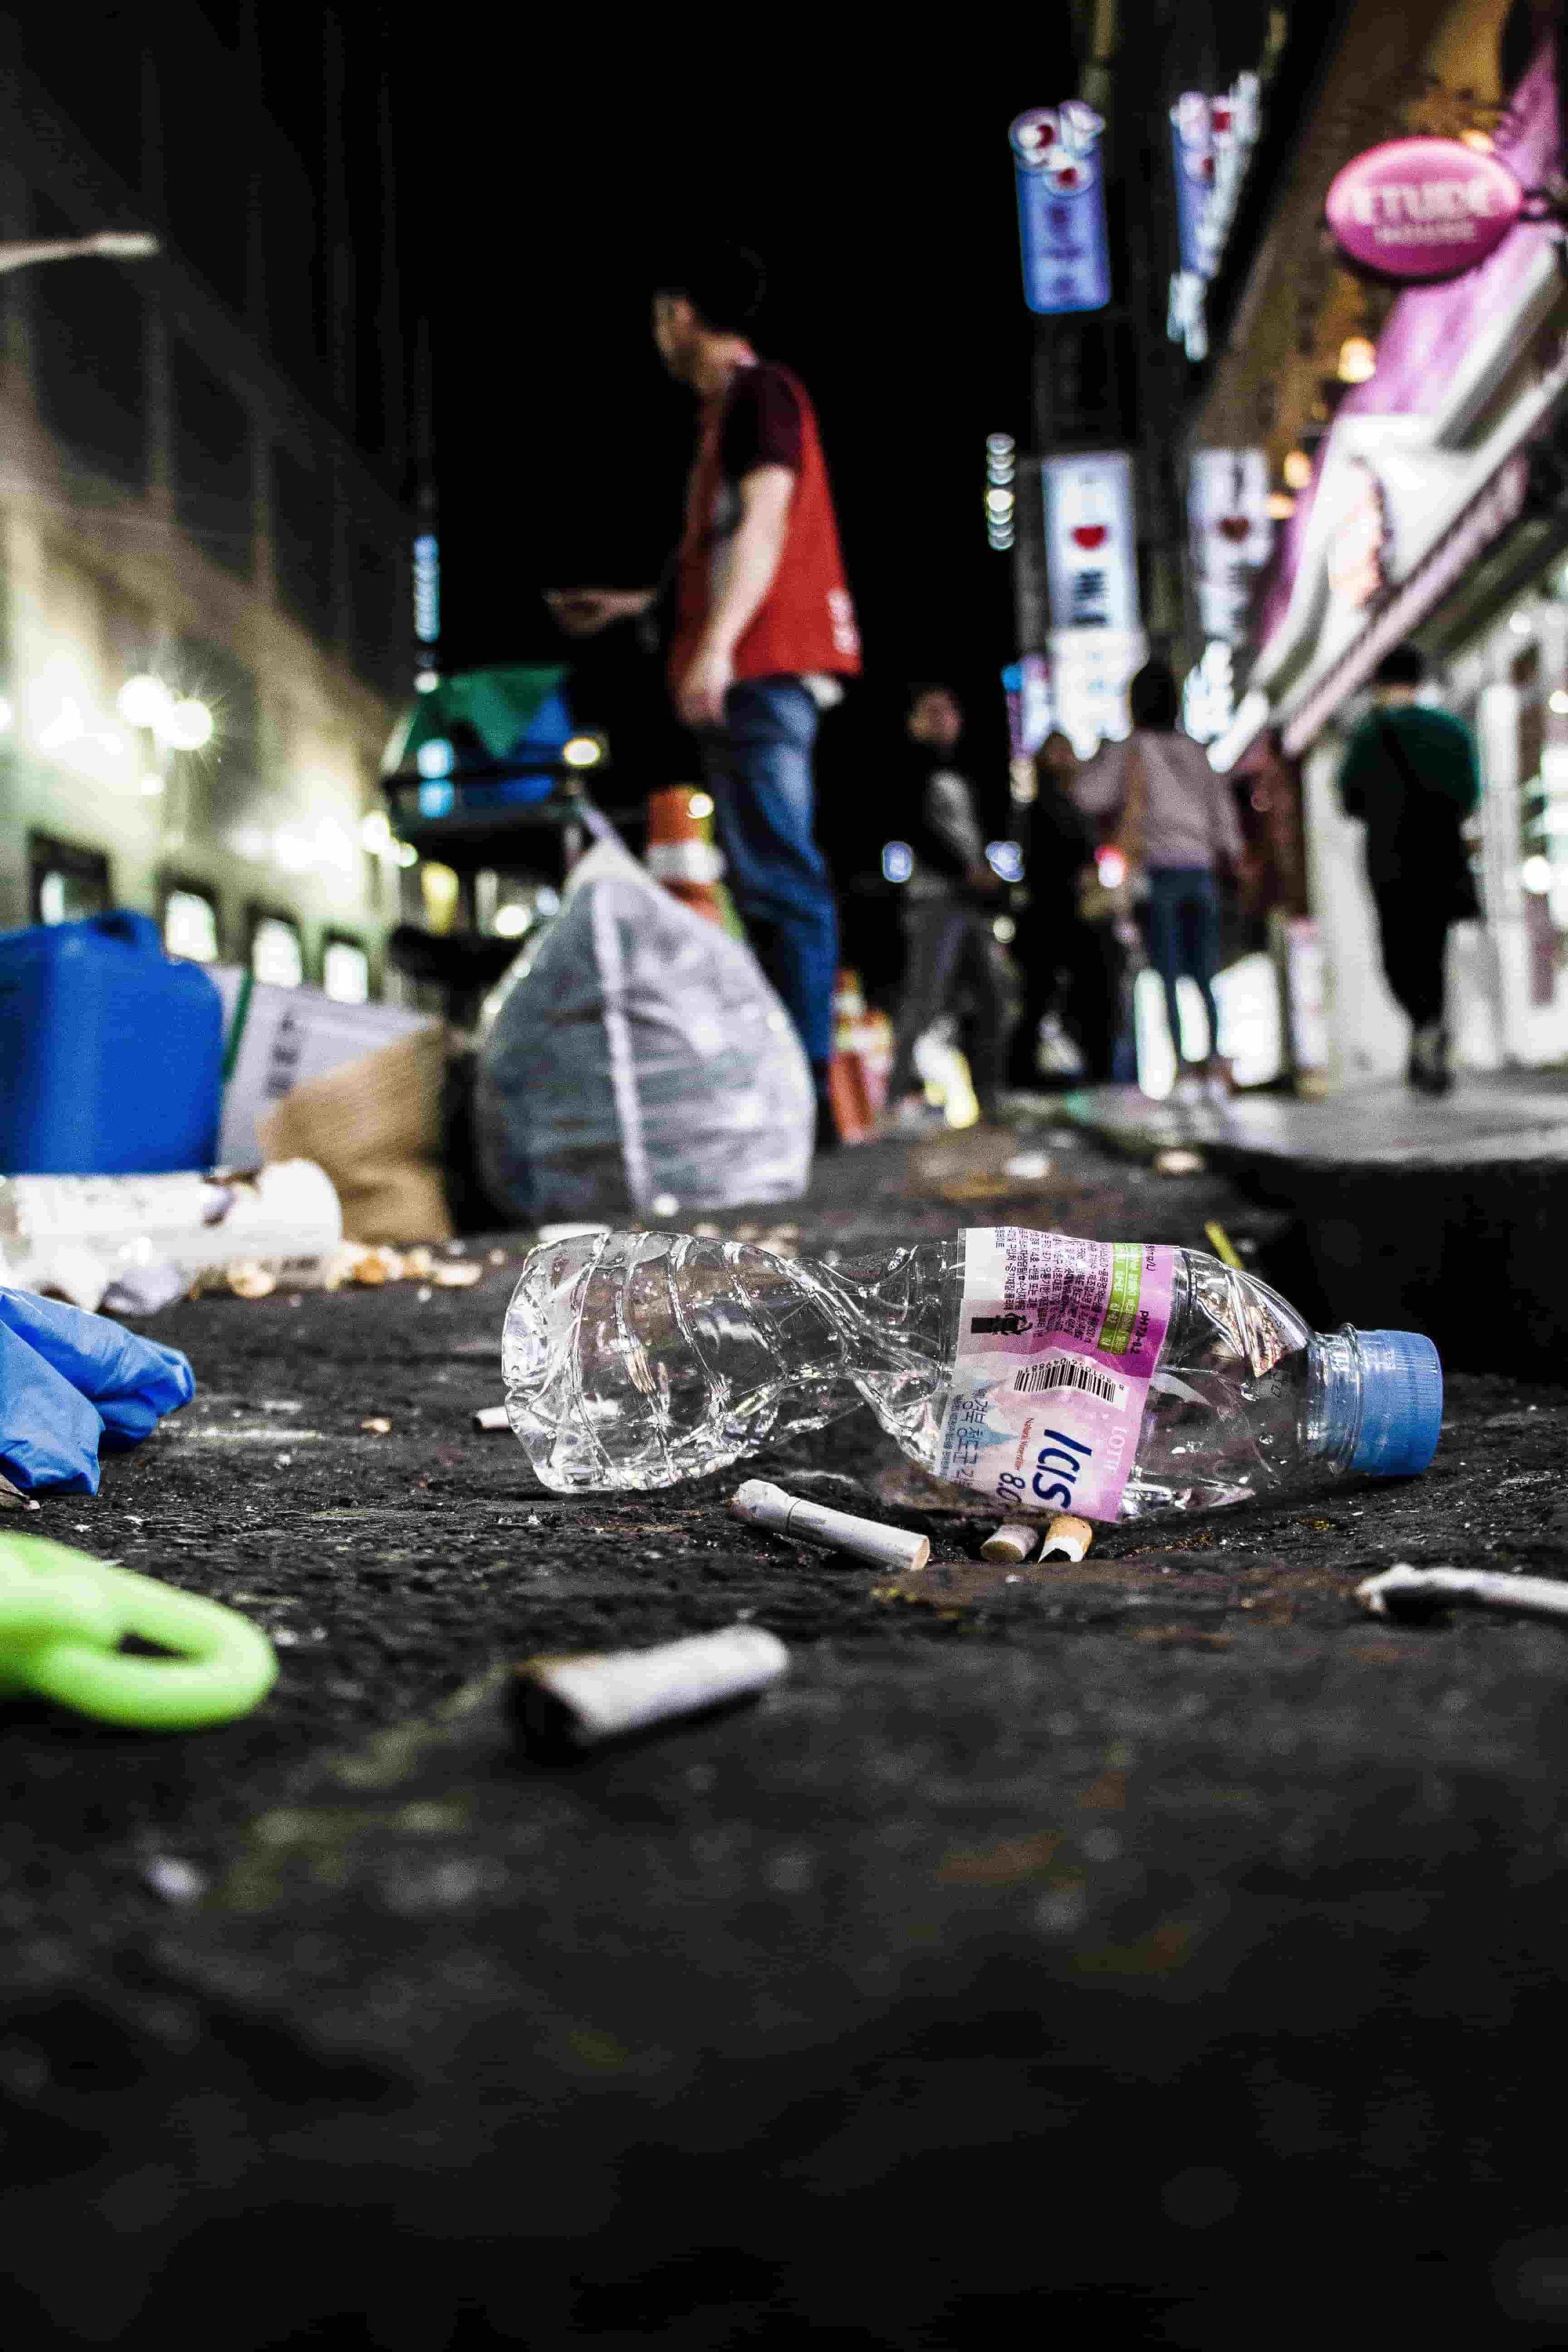 Rebalance your plastic footprint with rePurpose! www.goingzerowaste.com #plastic #plasticfree #rebalance #simplicity #ecofriendly #zerowaste